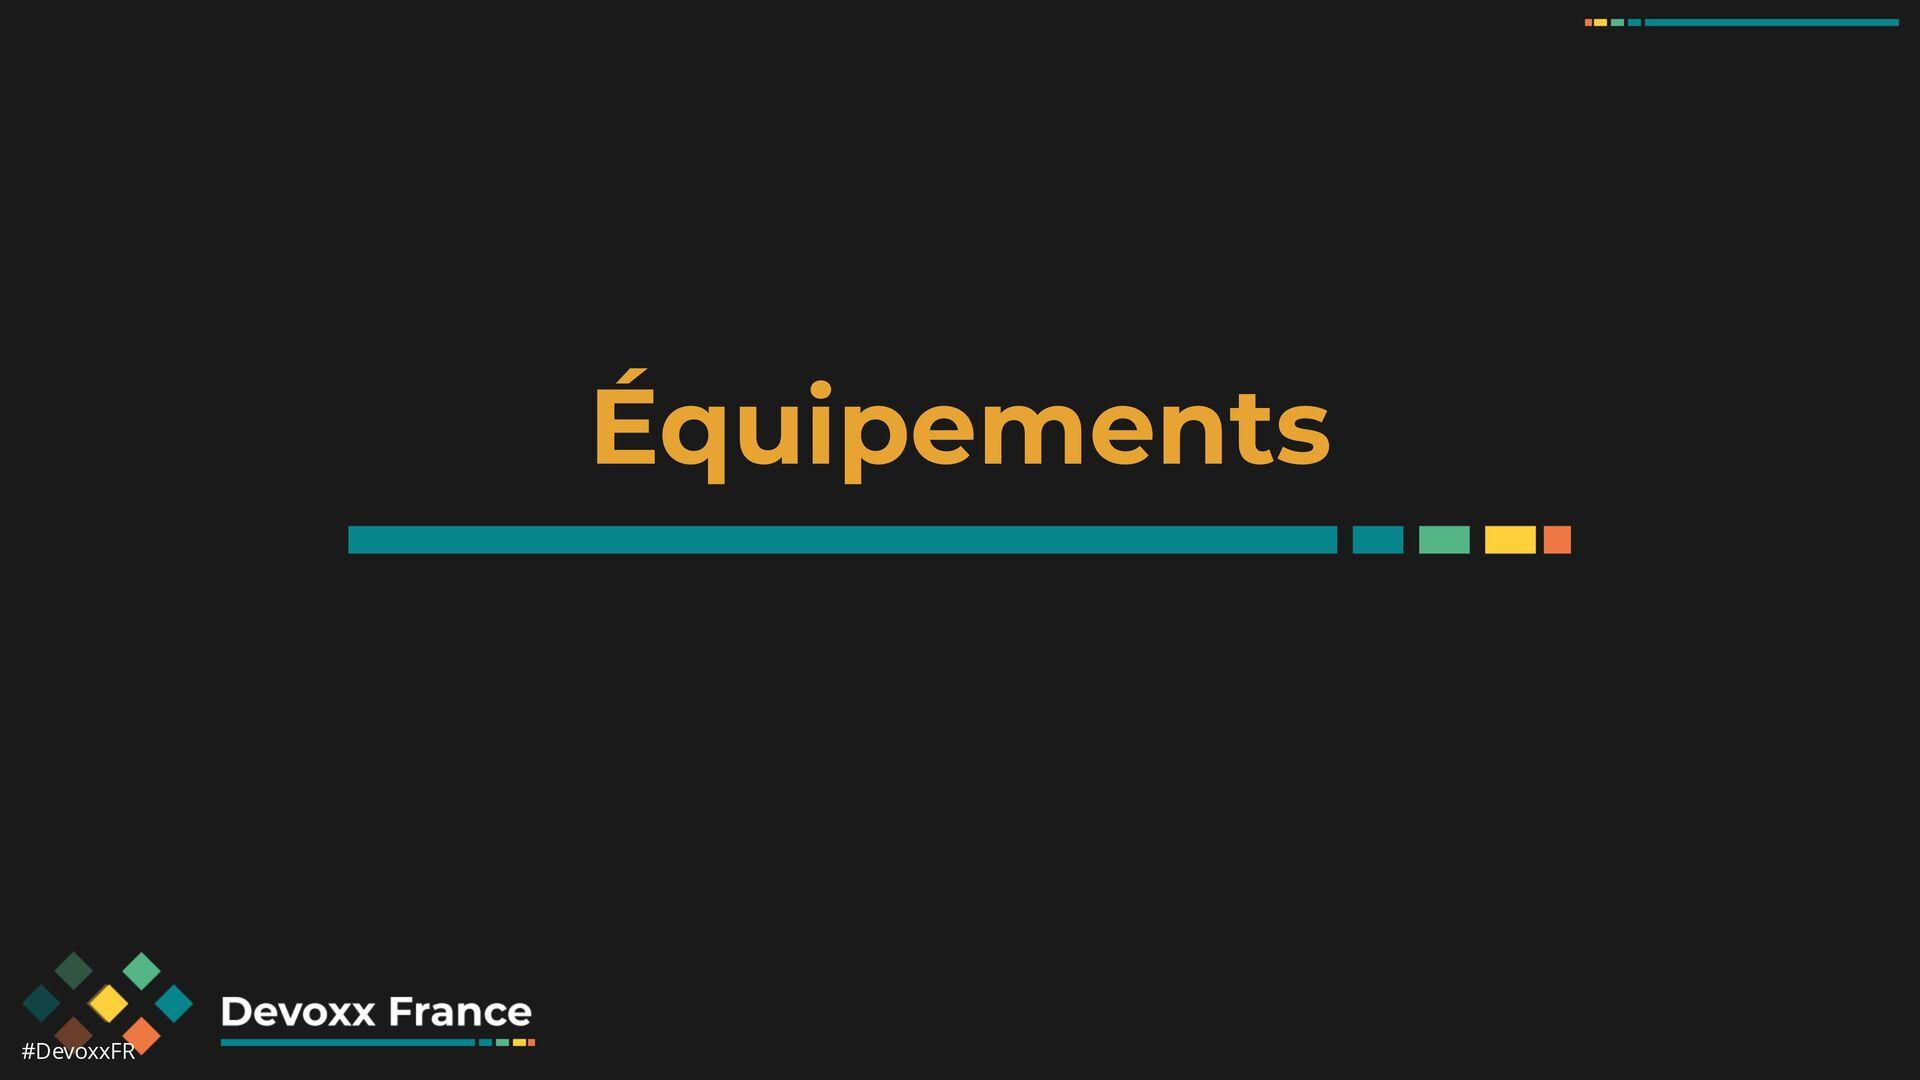 #DevoxxFR Équipements